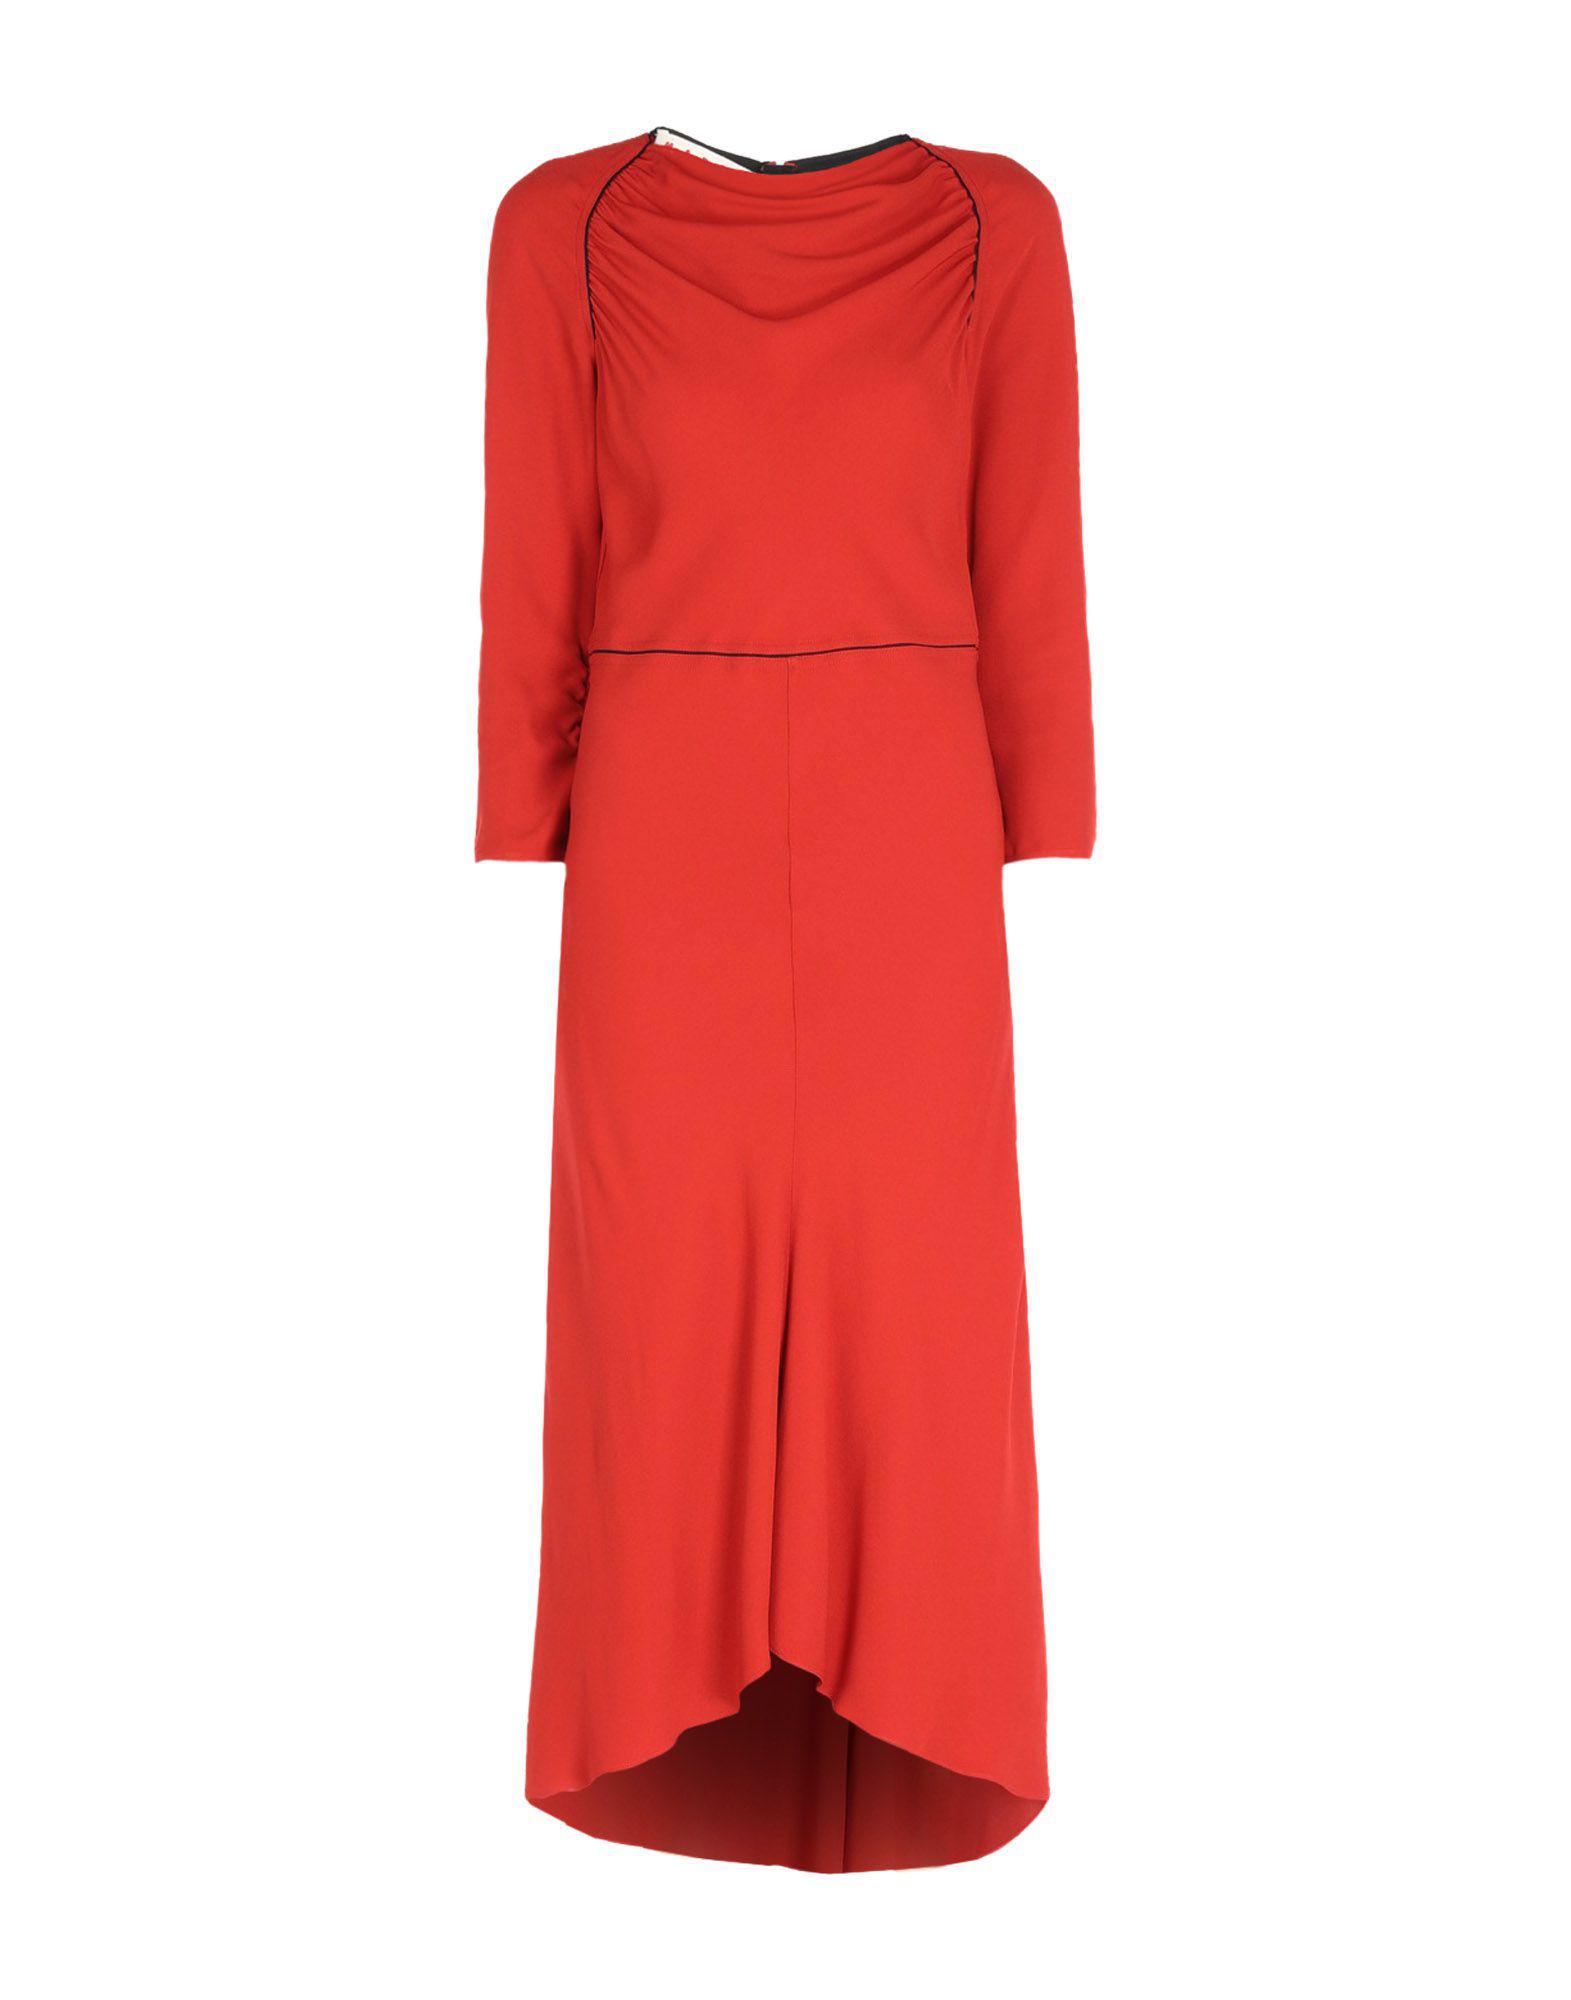 Marni Midi Dress In Red